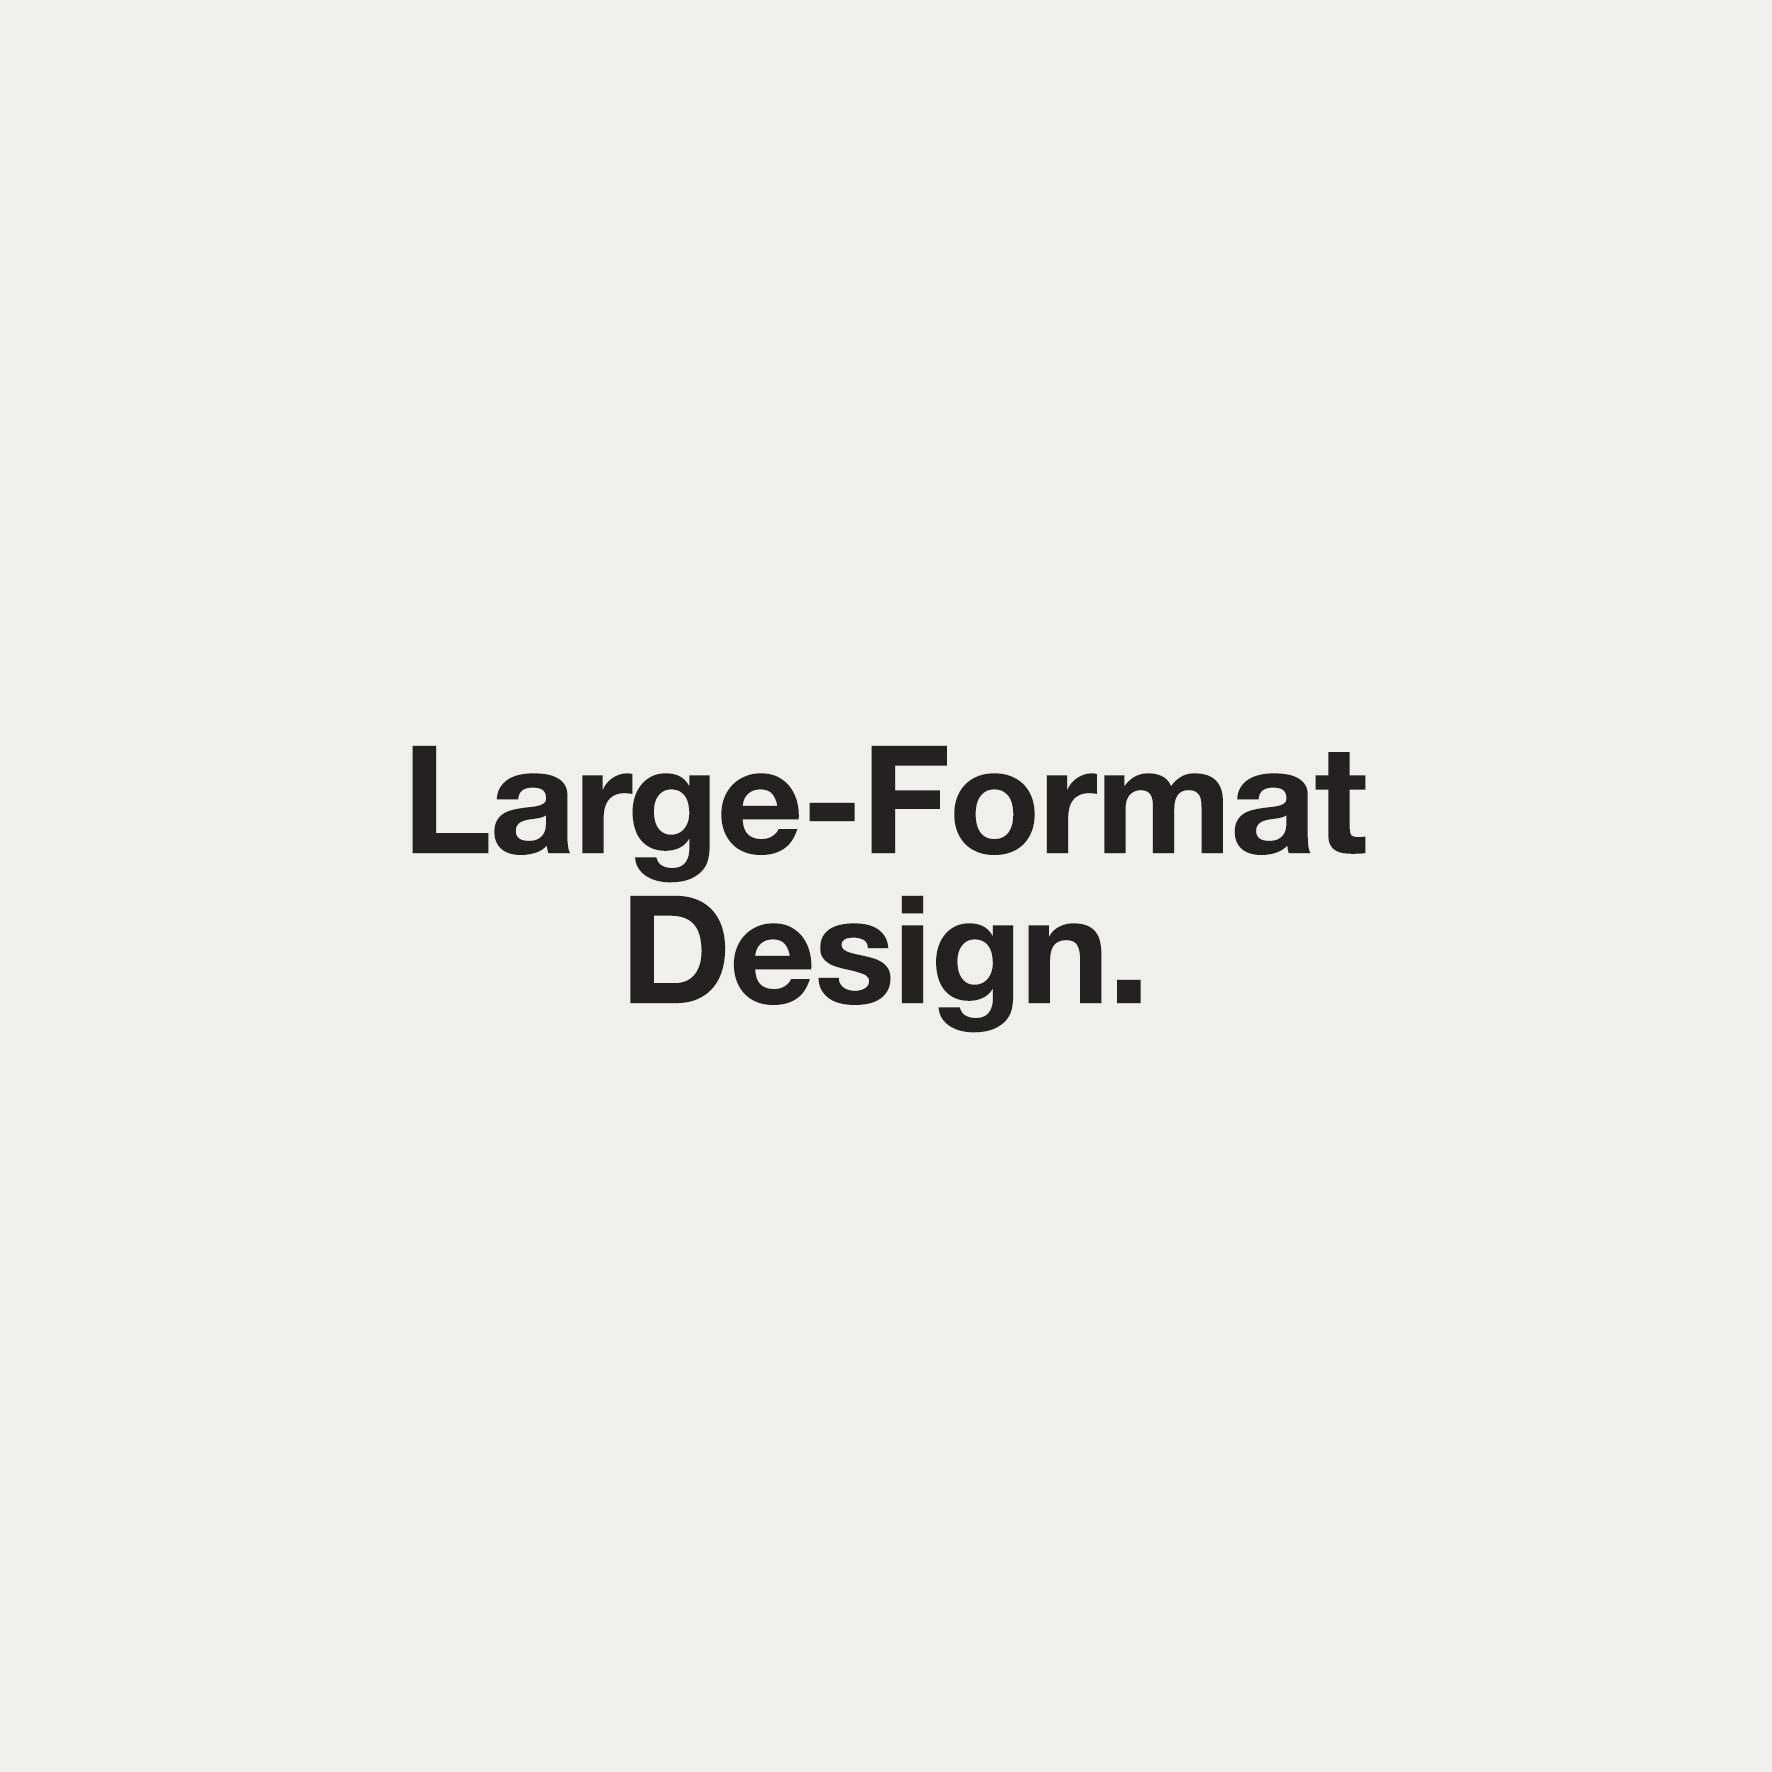 Design - Large Format Thumbnail.jpg